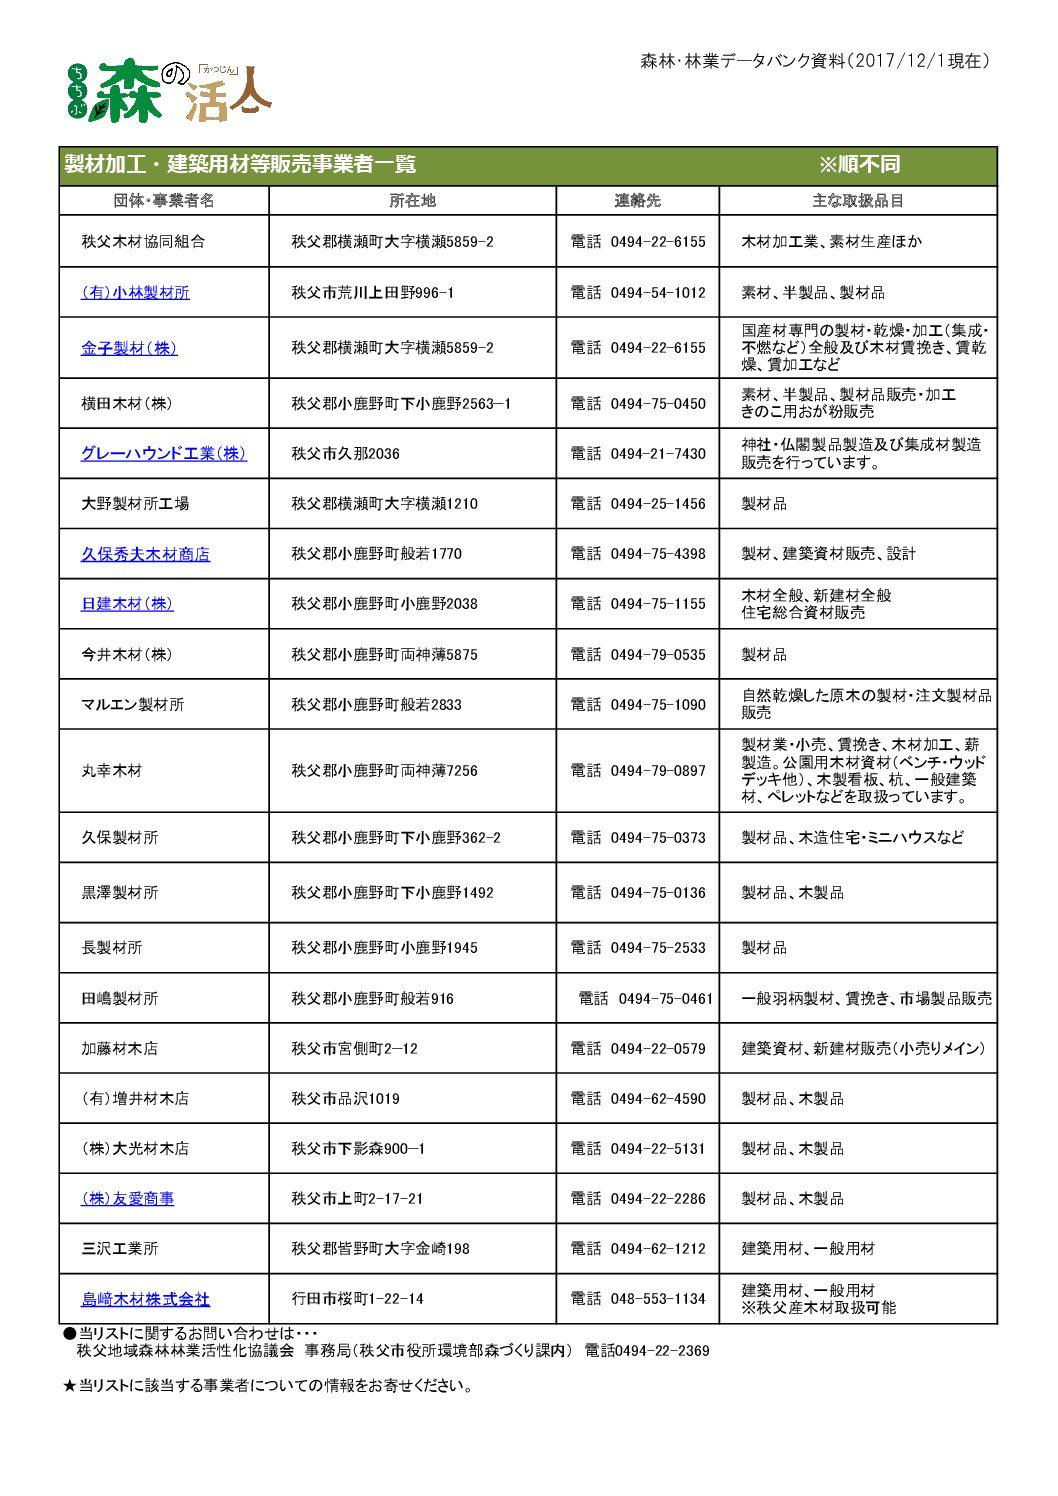 seizai20171201